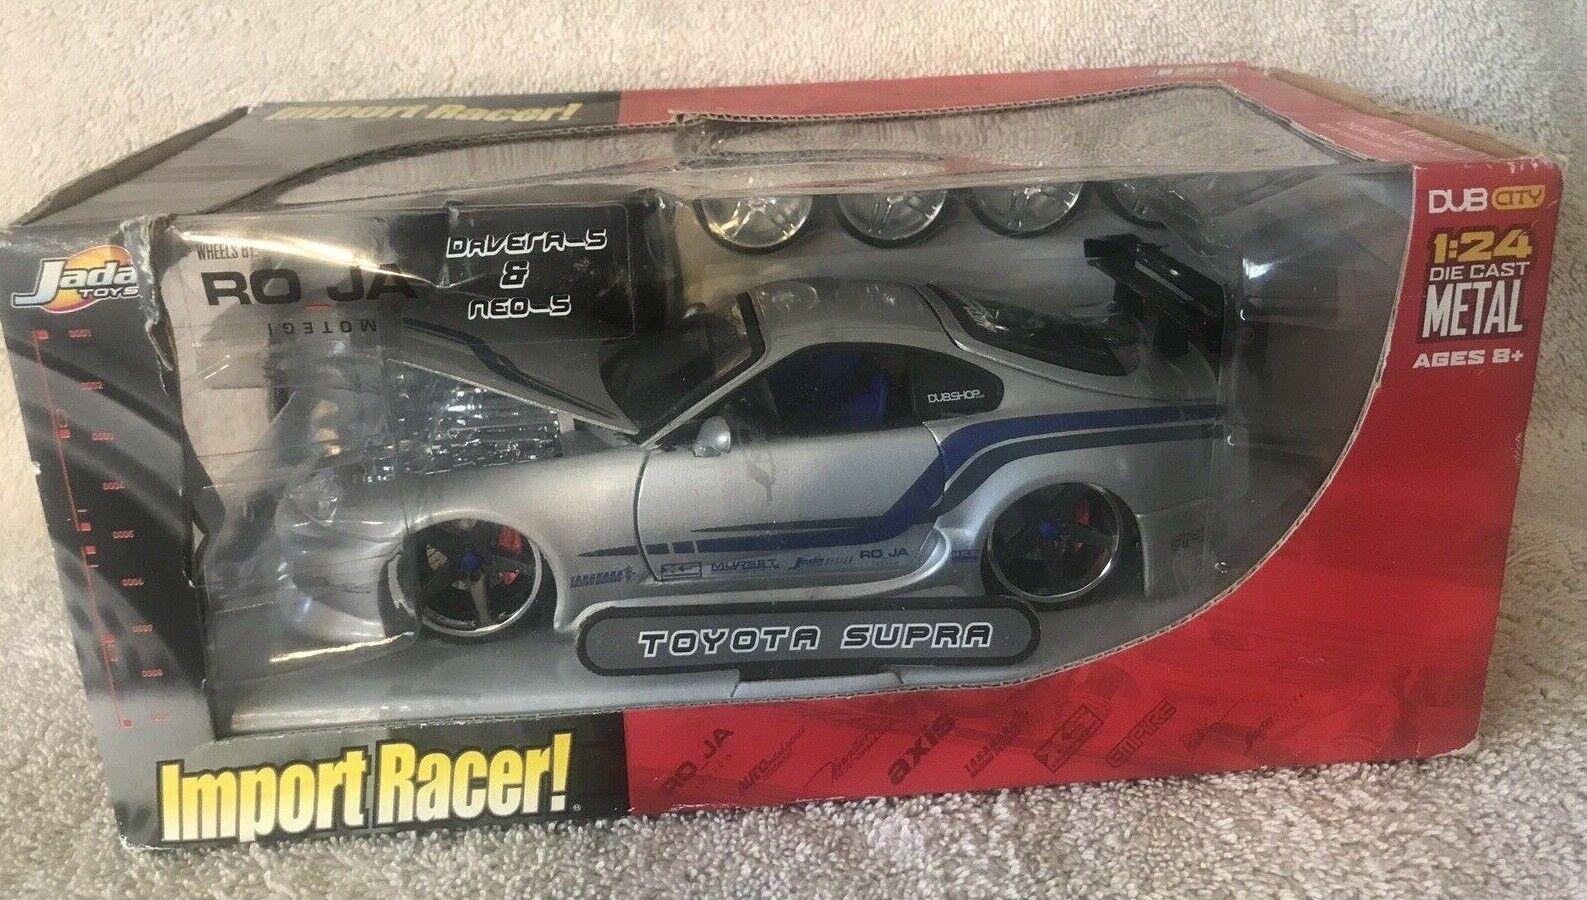 Import Racer Toyota Supra Dub City 1 24 Diecast Metal Jada Toys Silver NIB VHTF